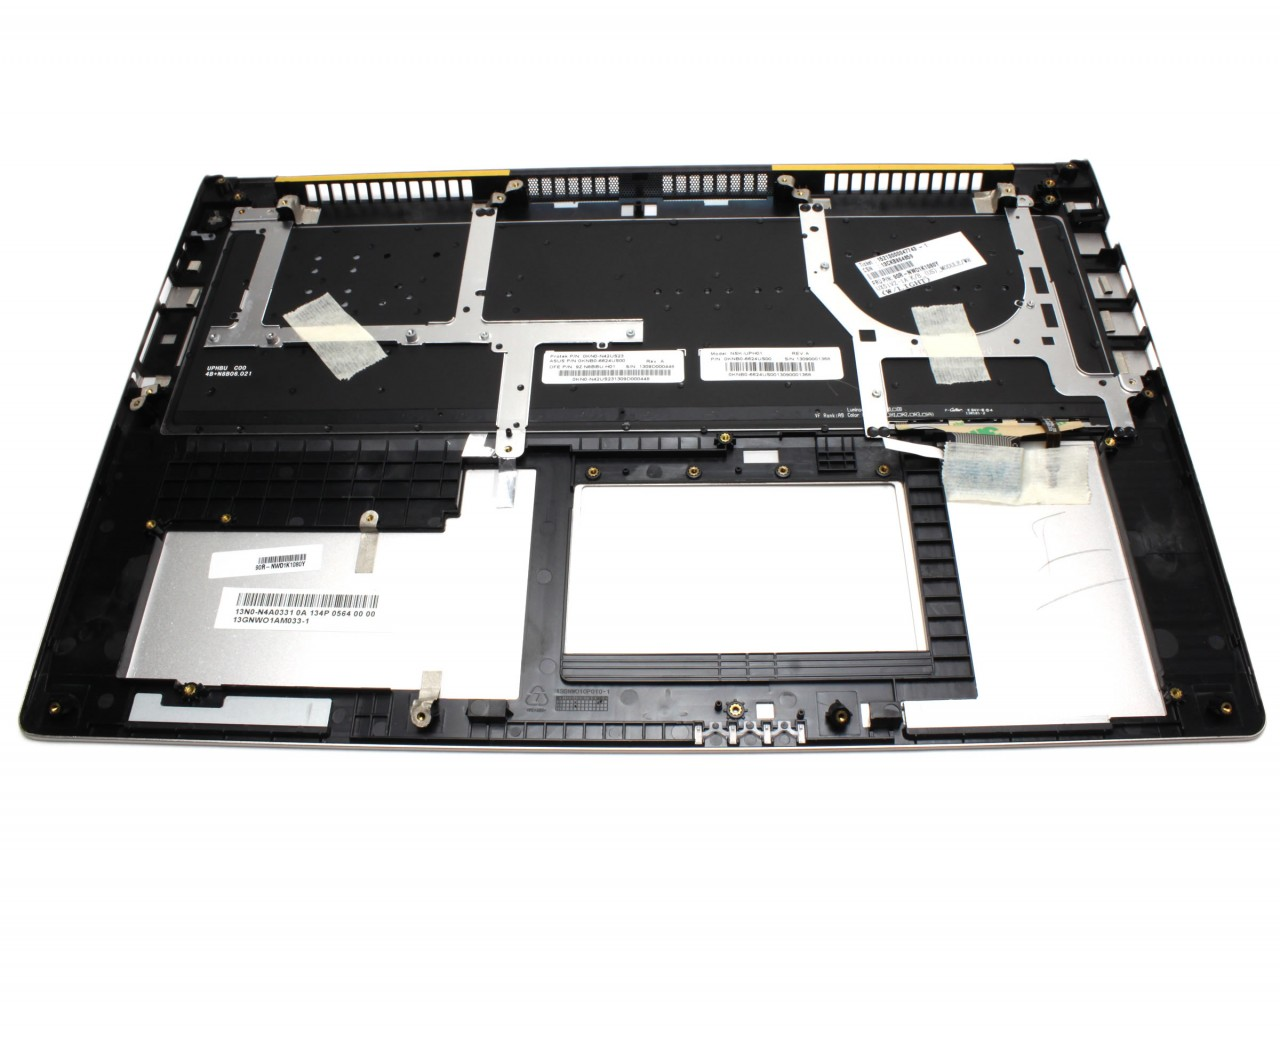 Tastatura Asus UX51 neagra cu Palmrest argintiu iluminata backlit imagine powerlaptop.ro 2021